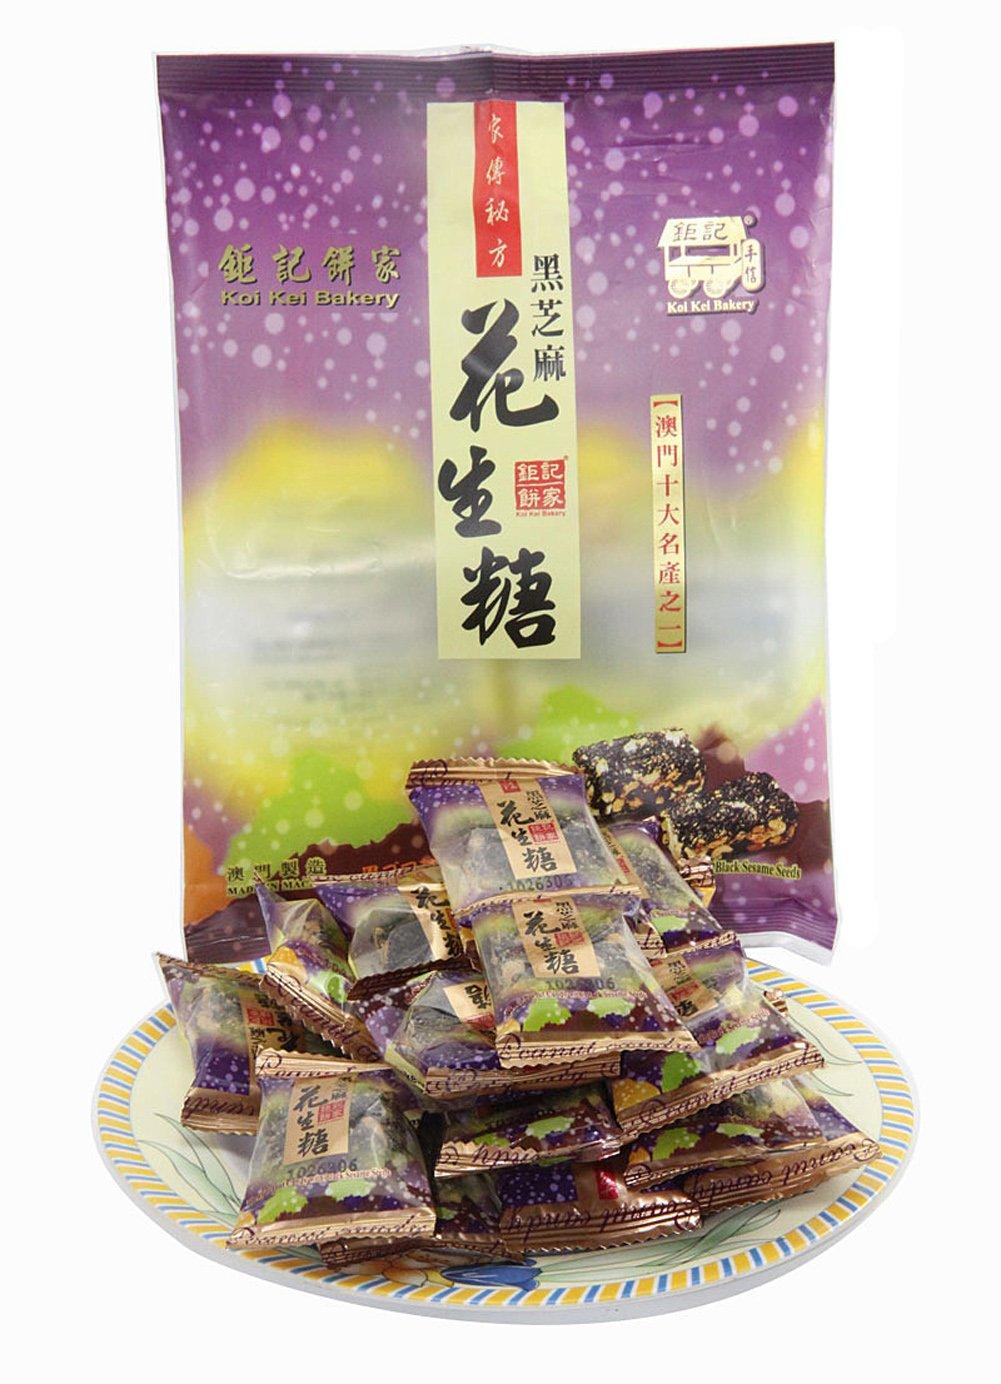 Helen Ou@Macao Specialty: Juji Souvenir Peanut Brittle Soft Candy with Black Sesame